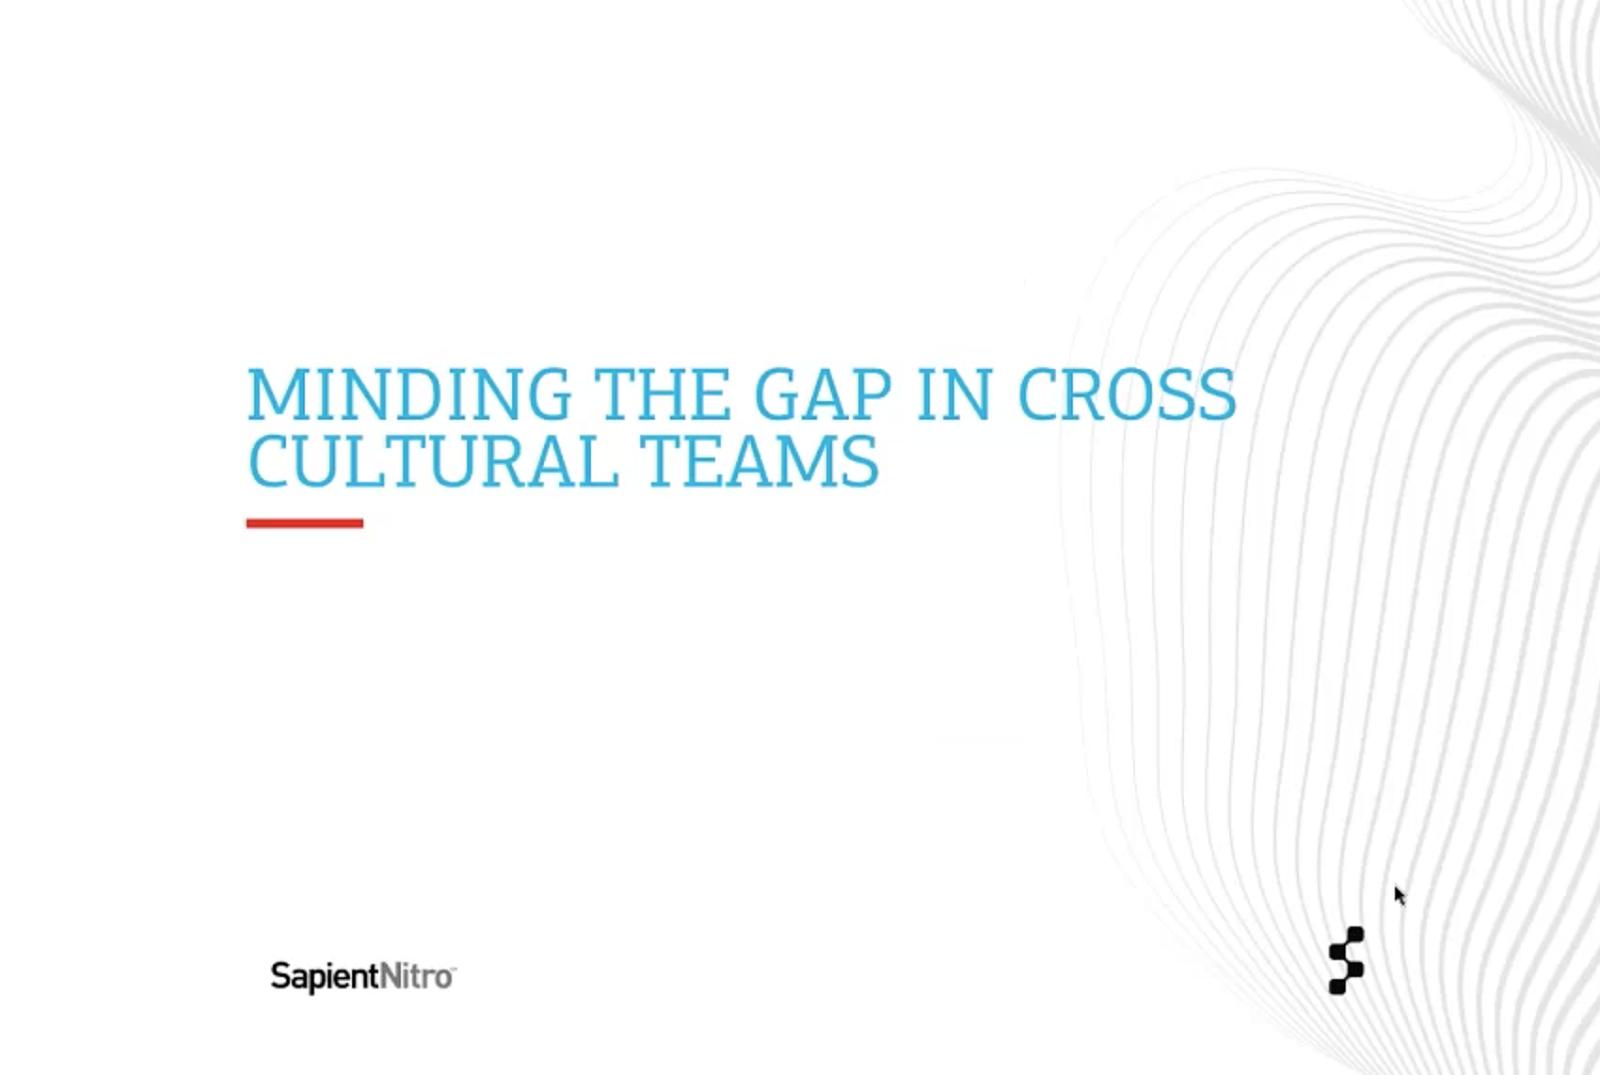 Minding the gap in cross-cultural teams